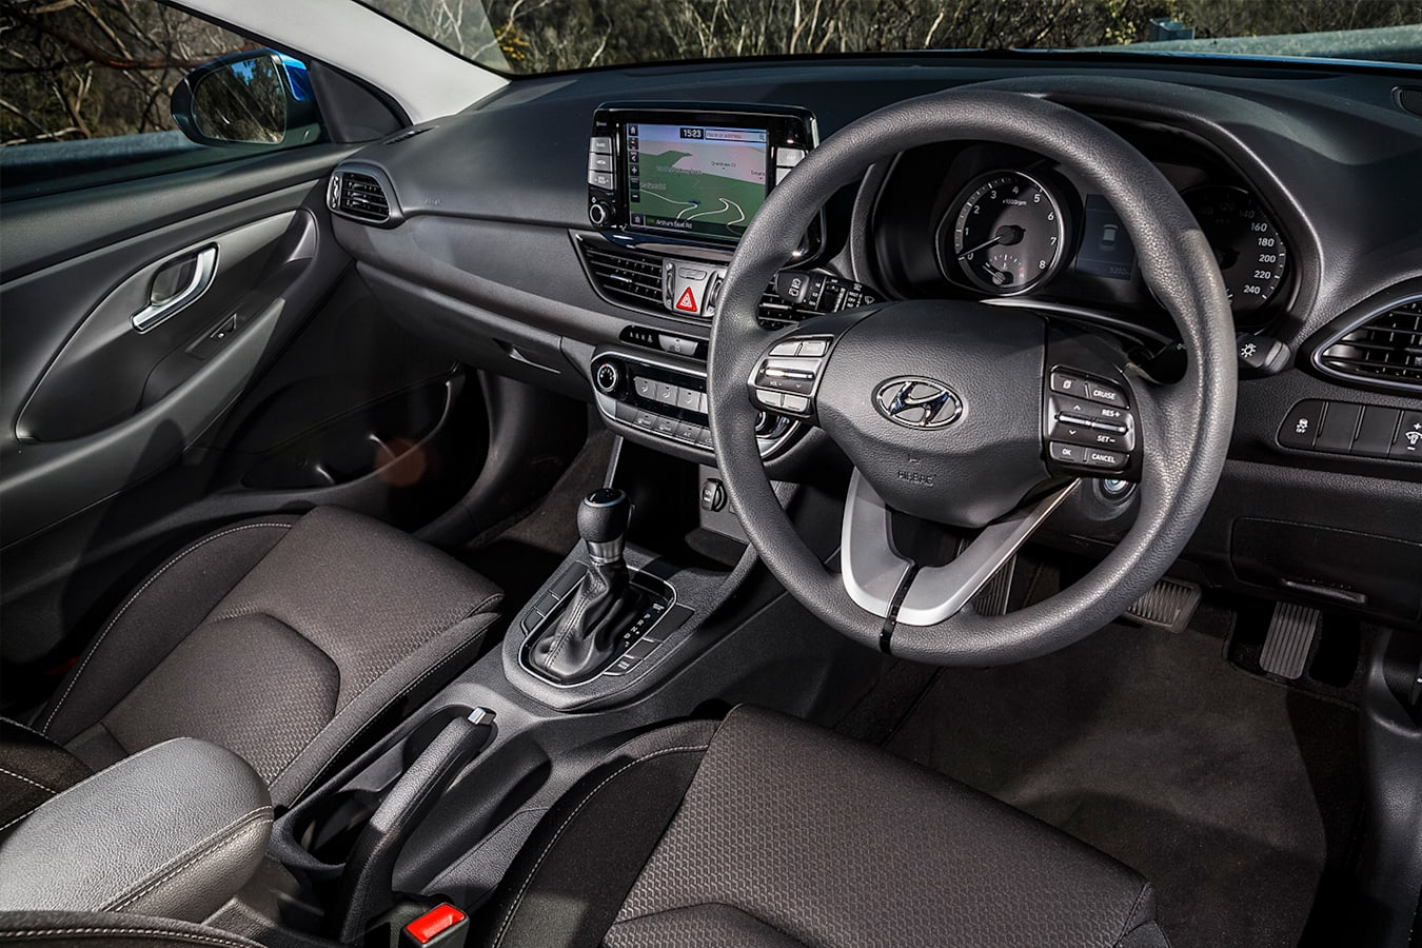 Hatchback Three Way Hyundai I 30 Interior Jpg